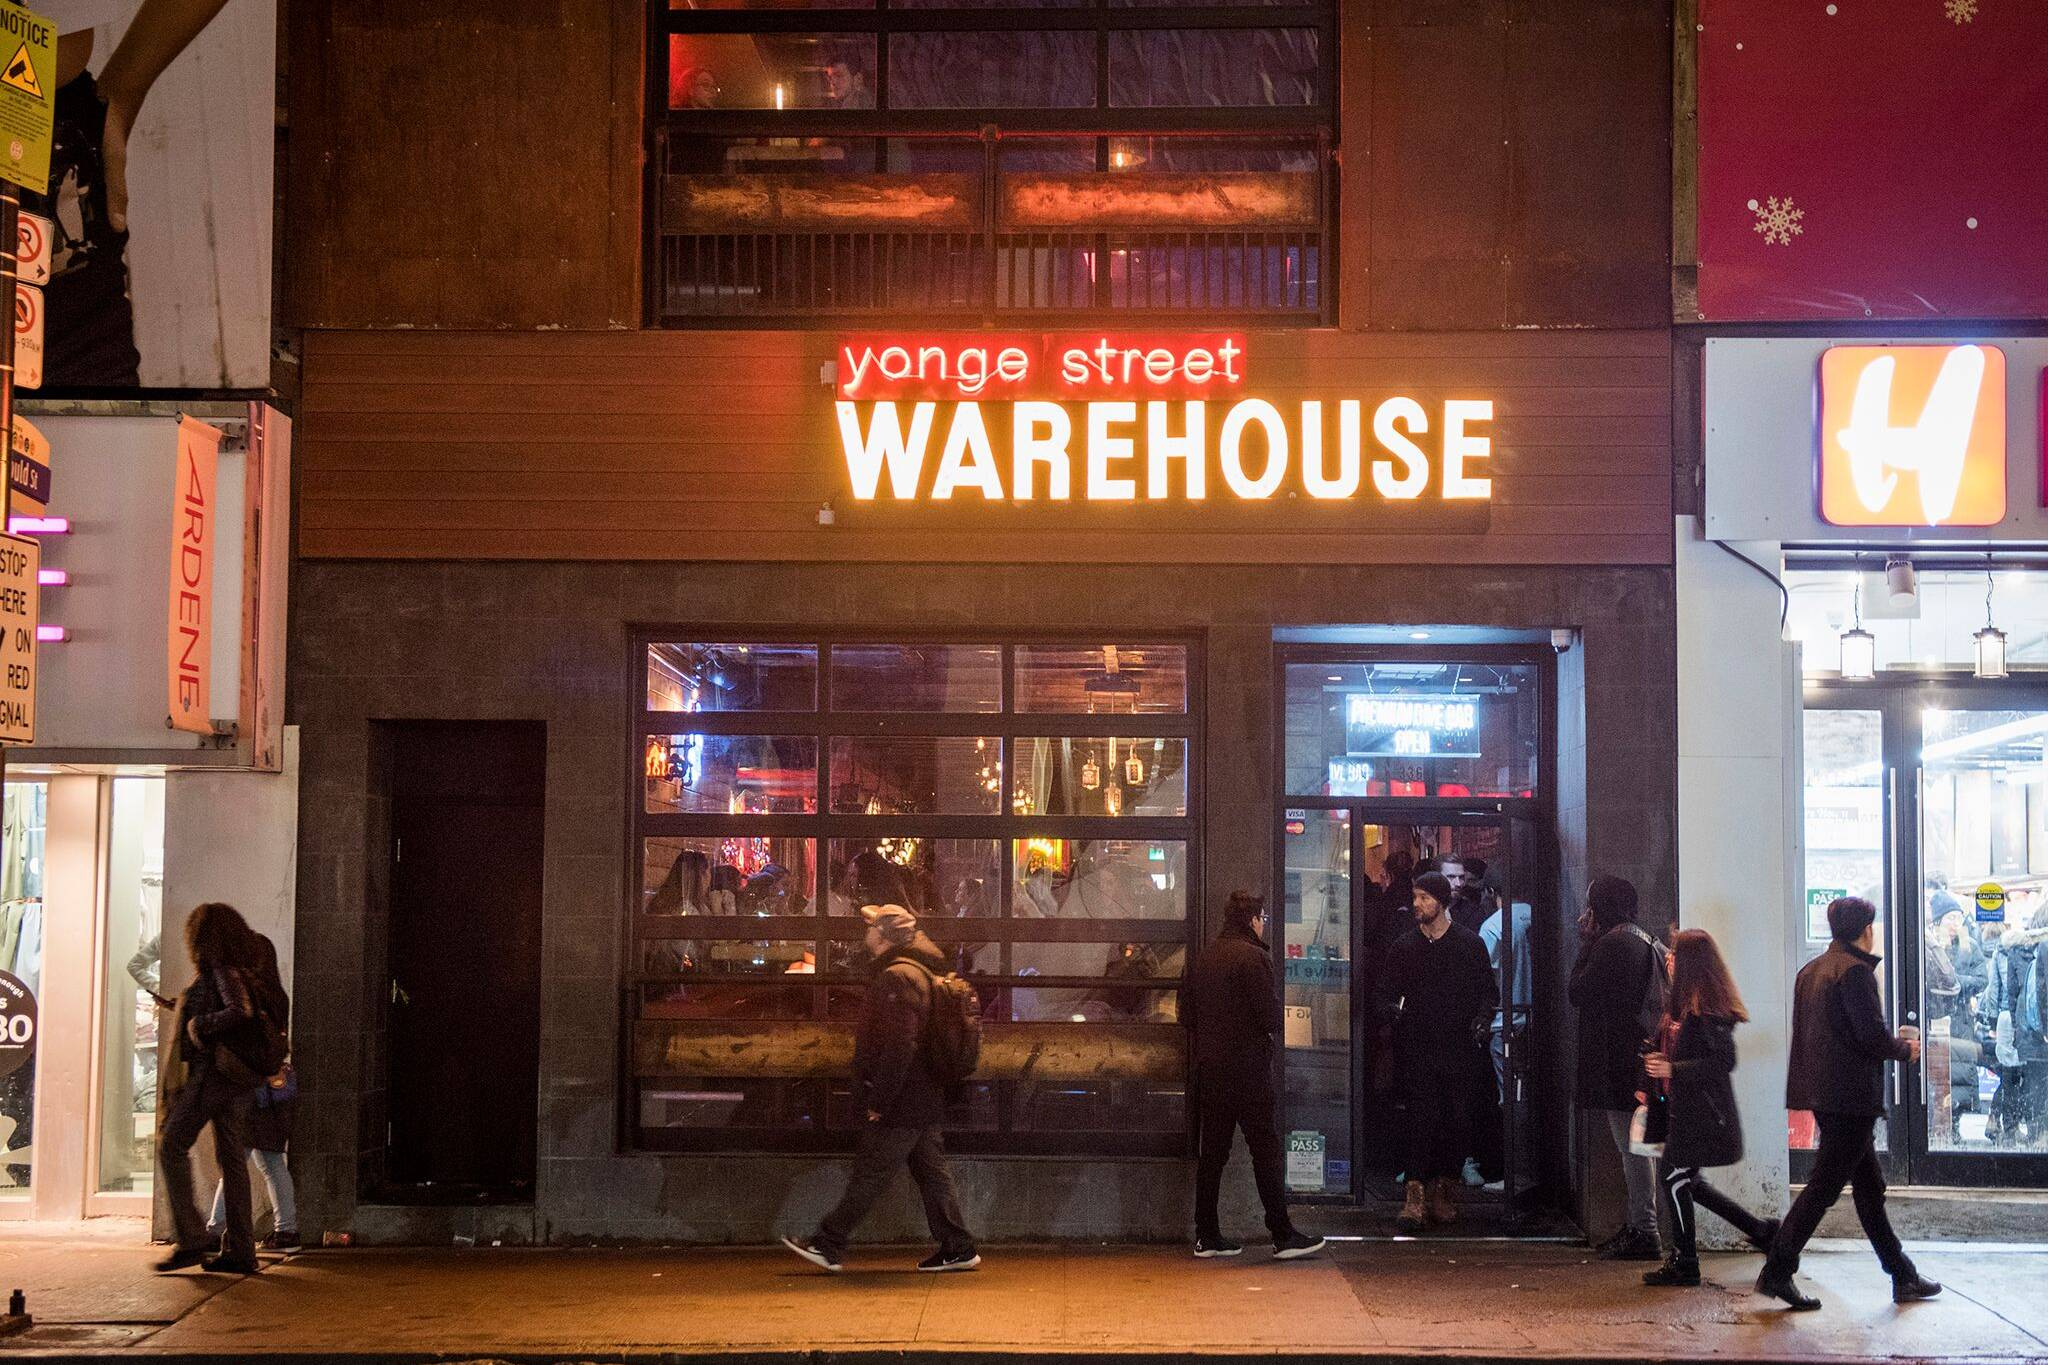 yonge street warehouse covid